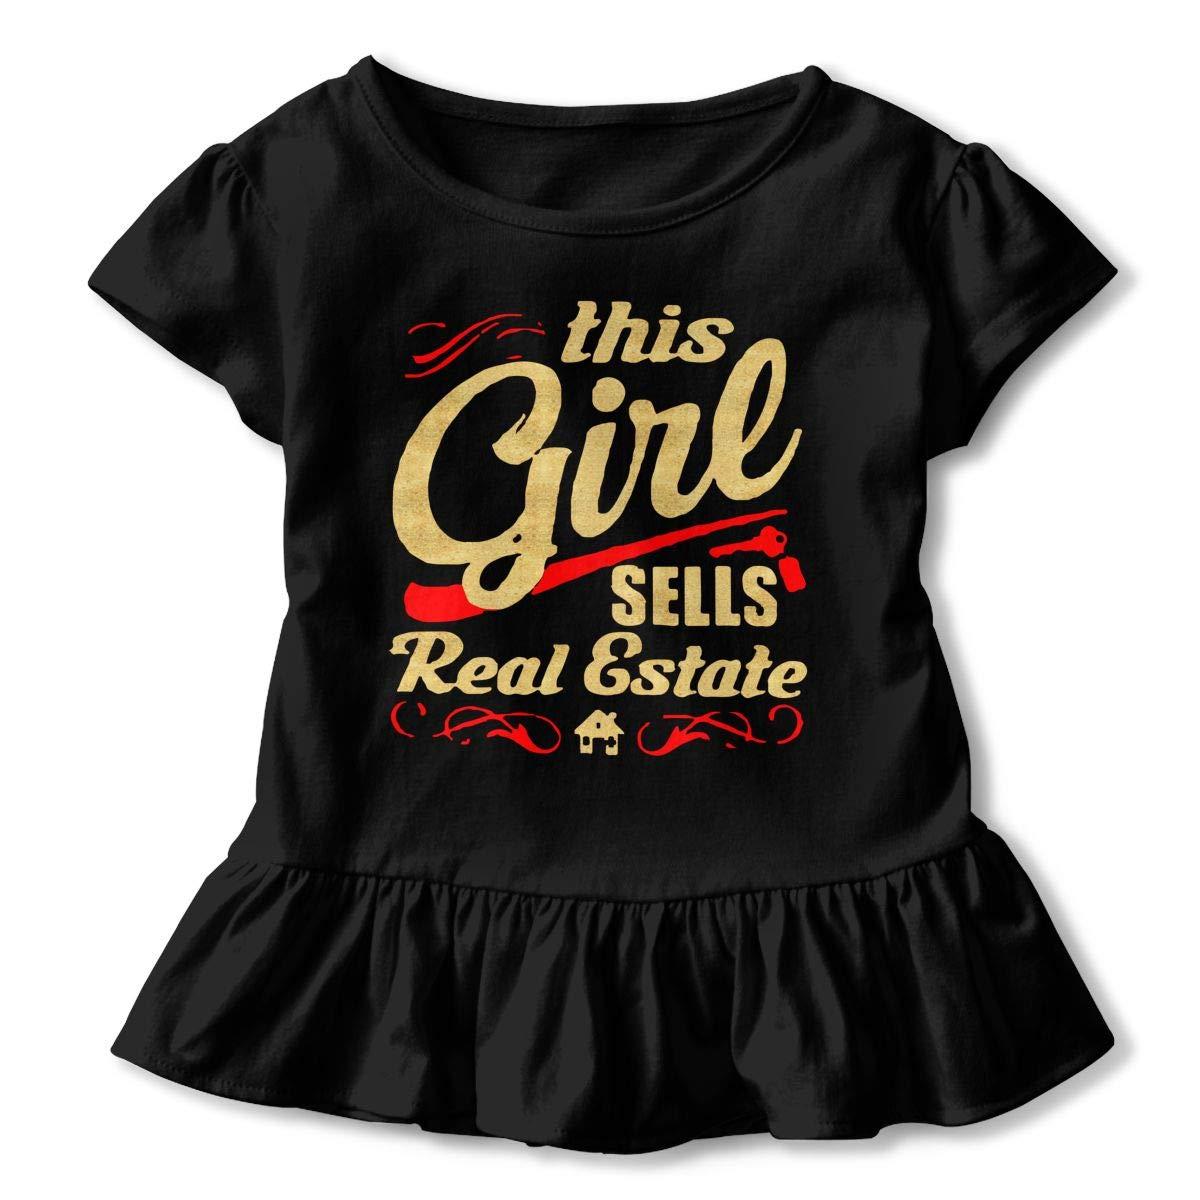 This Girl Sells Real Estate Toddler Baby Girls Short Sleeve Ruffle T-Shirt